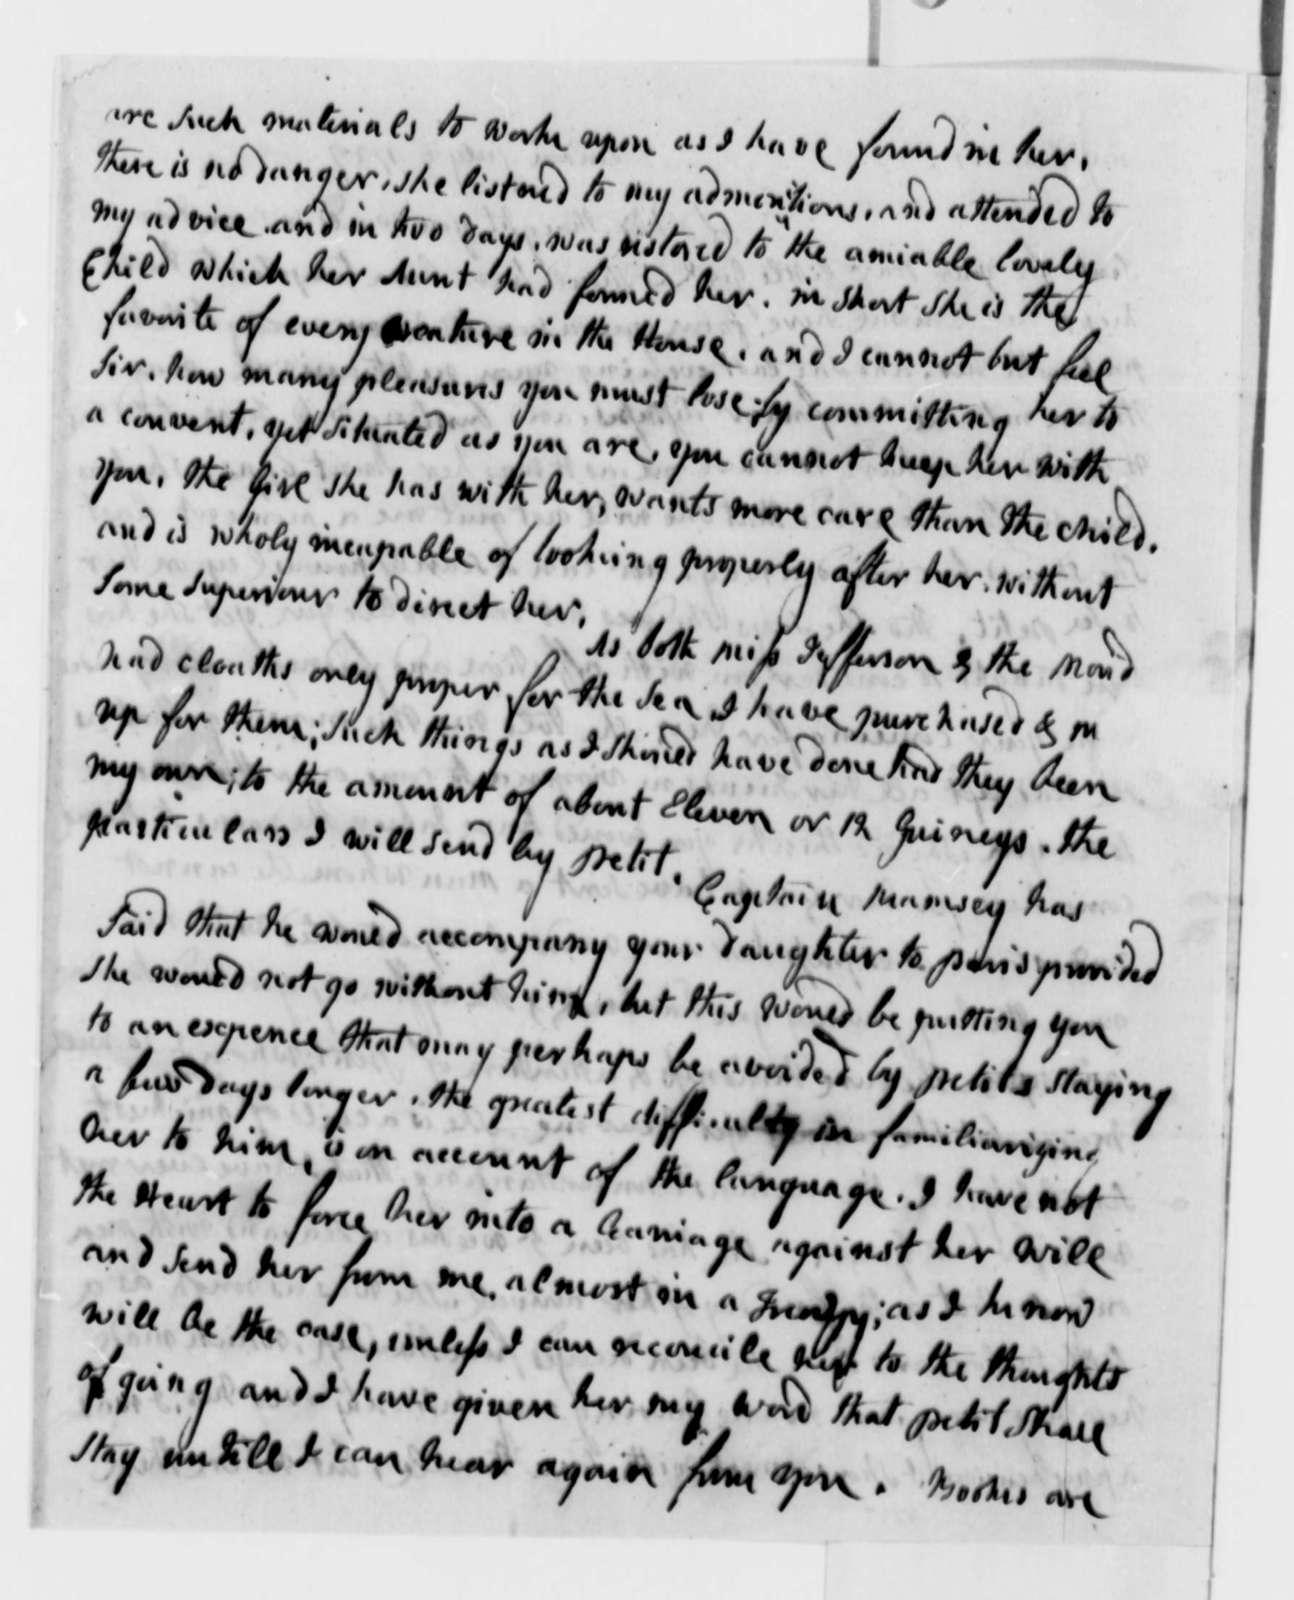 Abigail Smith Adams to Thomas Jefferson, July 6, 1787